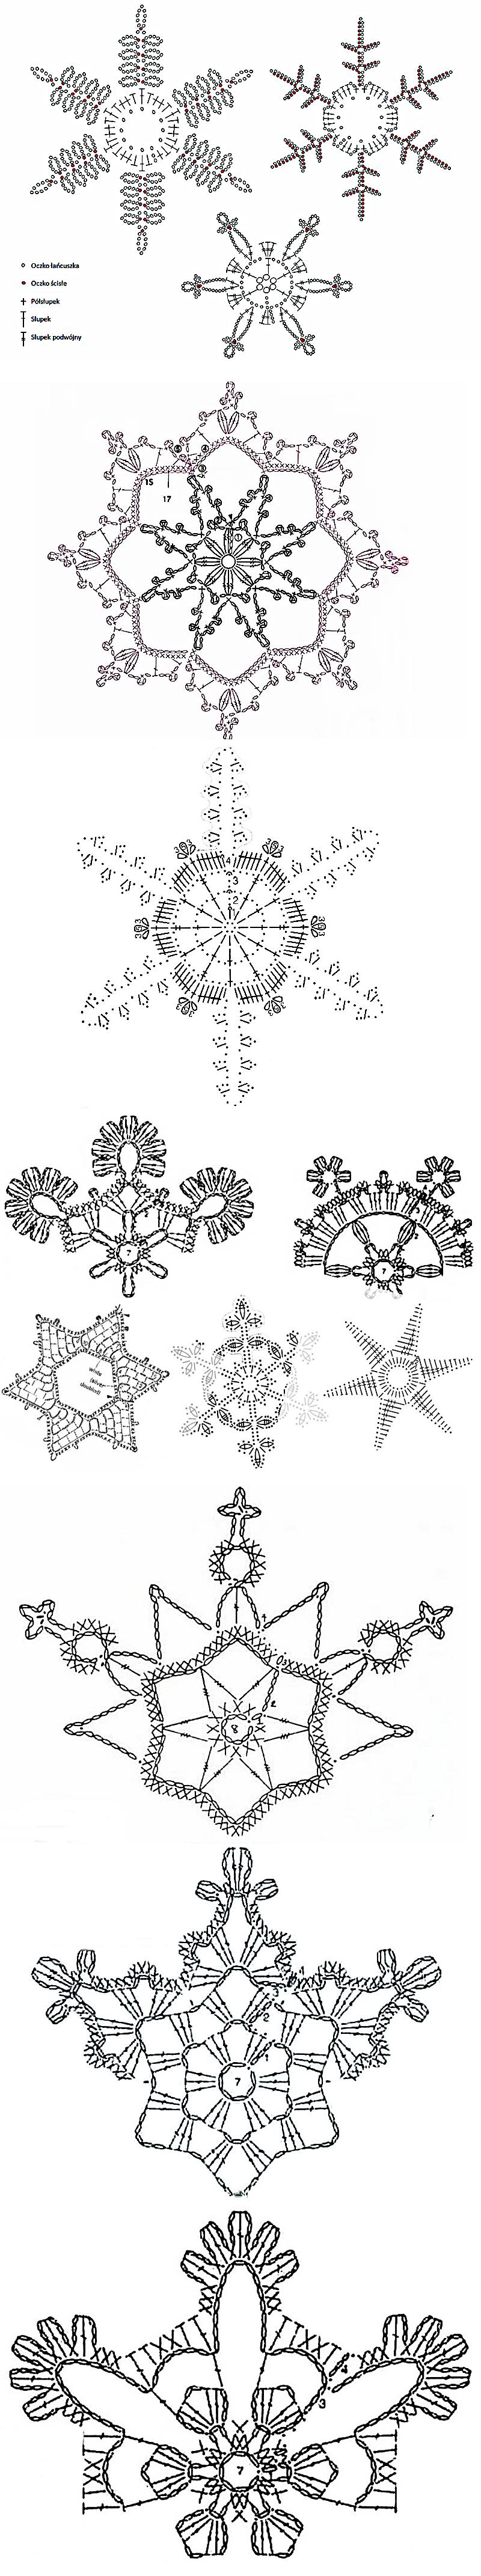 snowflakes crochet 72   GANCHILLO CIRCULAR Y MAS   Pinterest ...